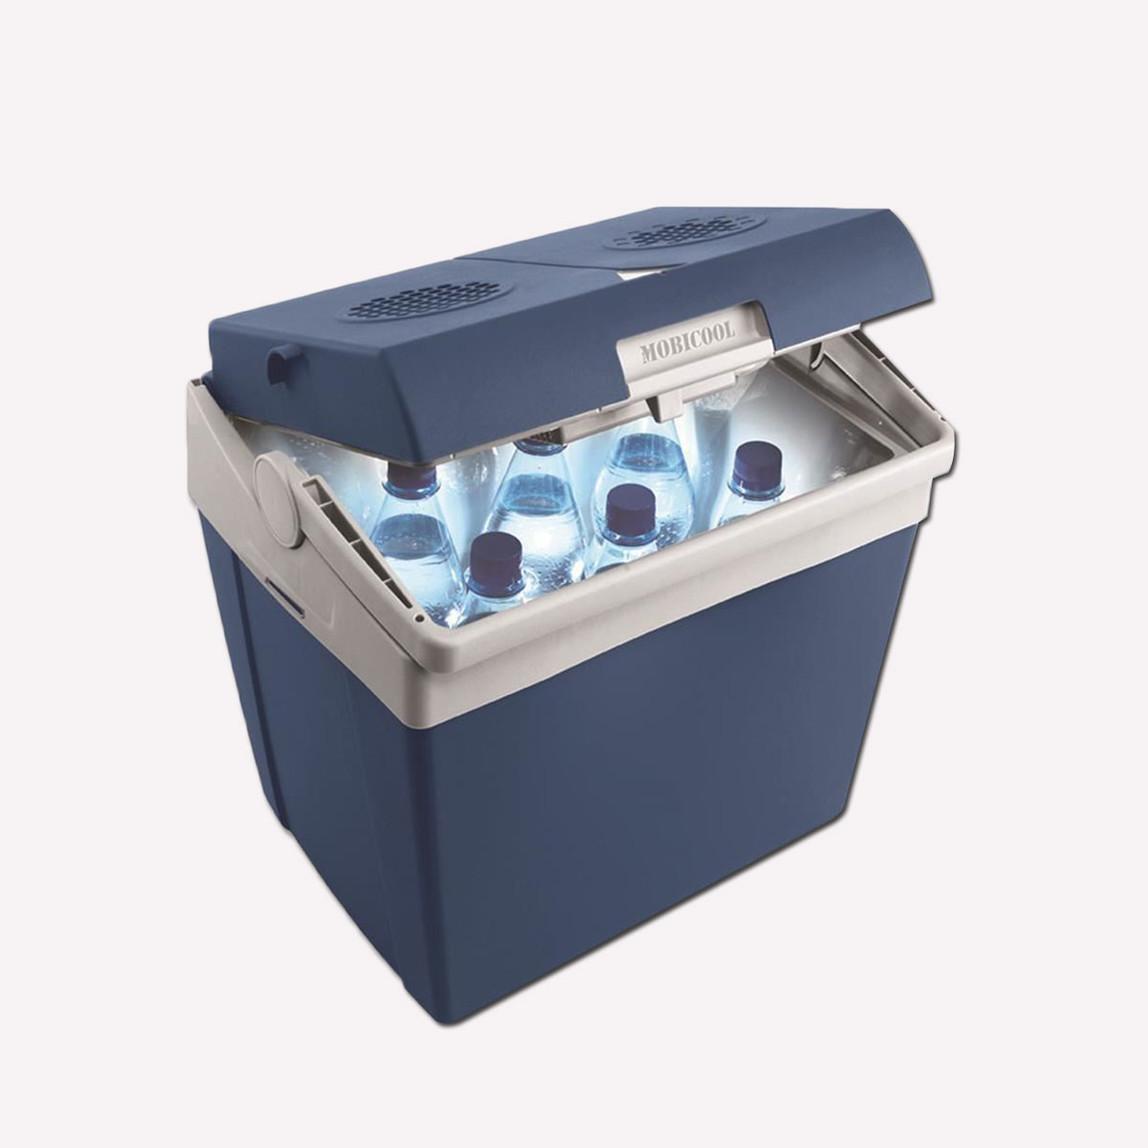 Mobicool T30 29 Lt Oto Buzdolabı